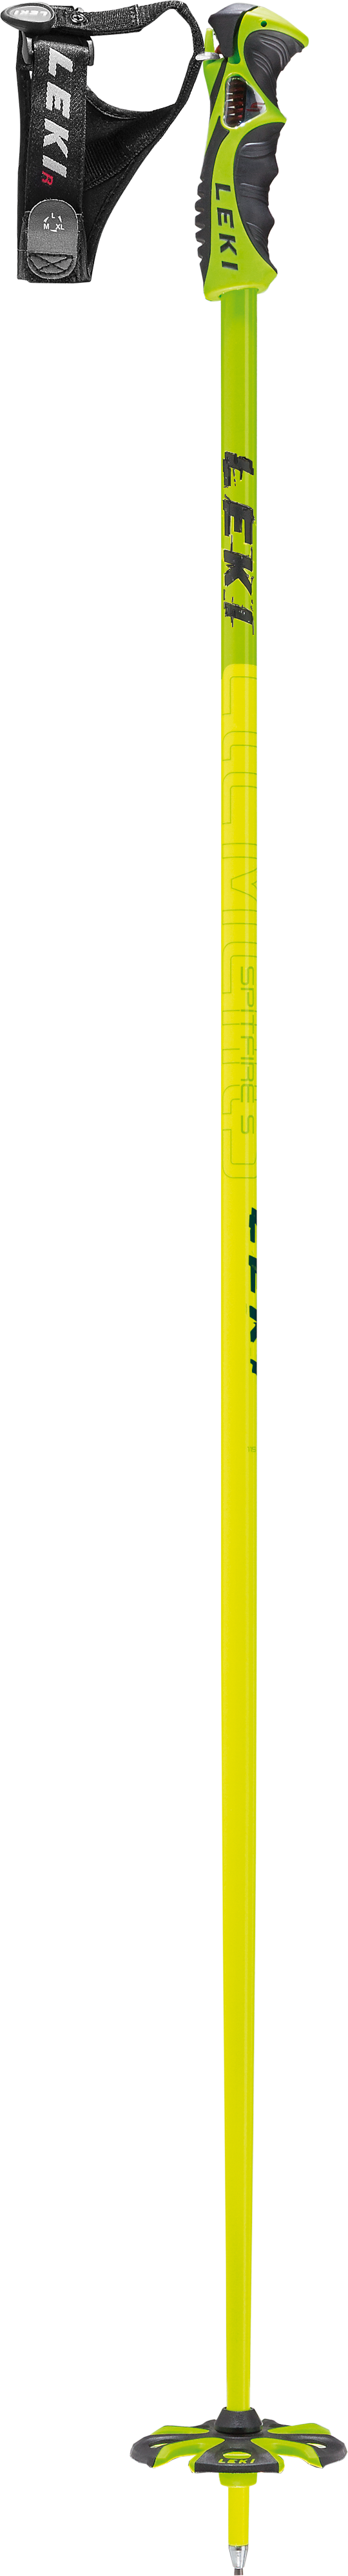 spitfire s 130 cm